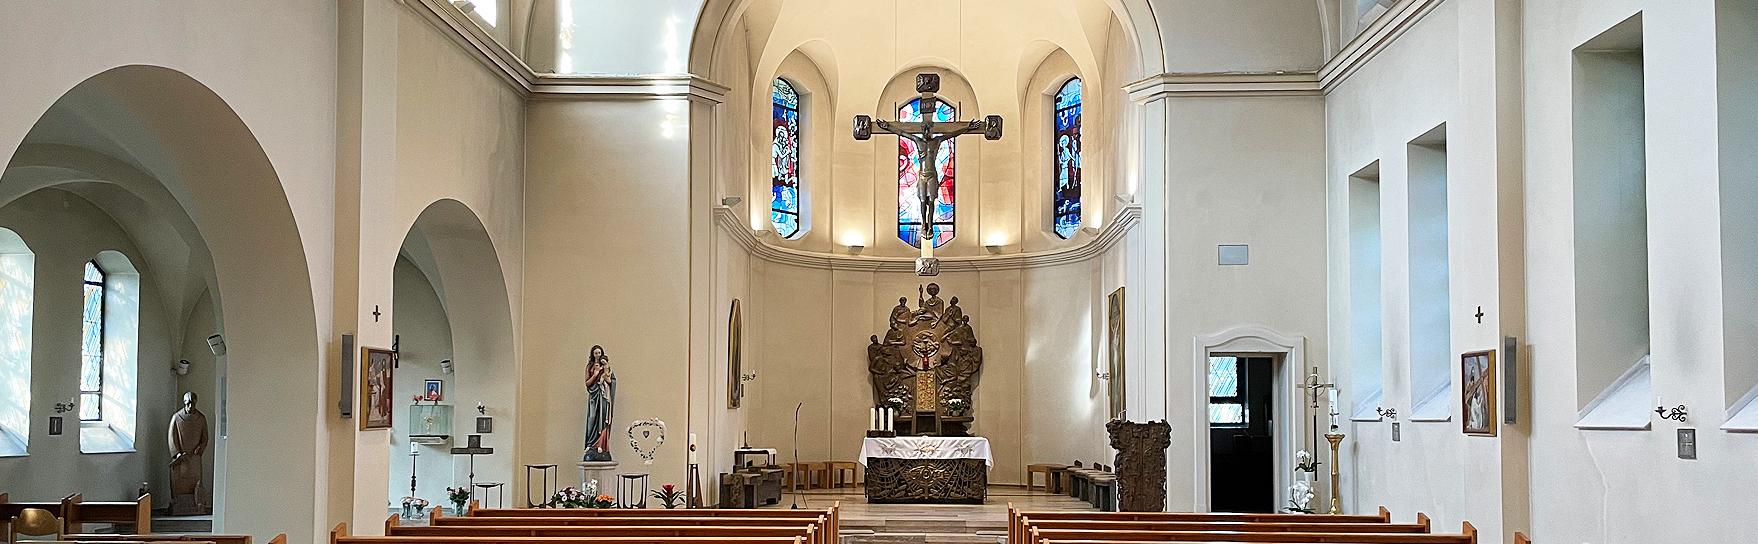 Kircheninnenraum der Pfarrei St. Franz Joseph Hamburg-Harburg